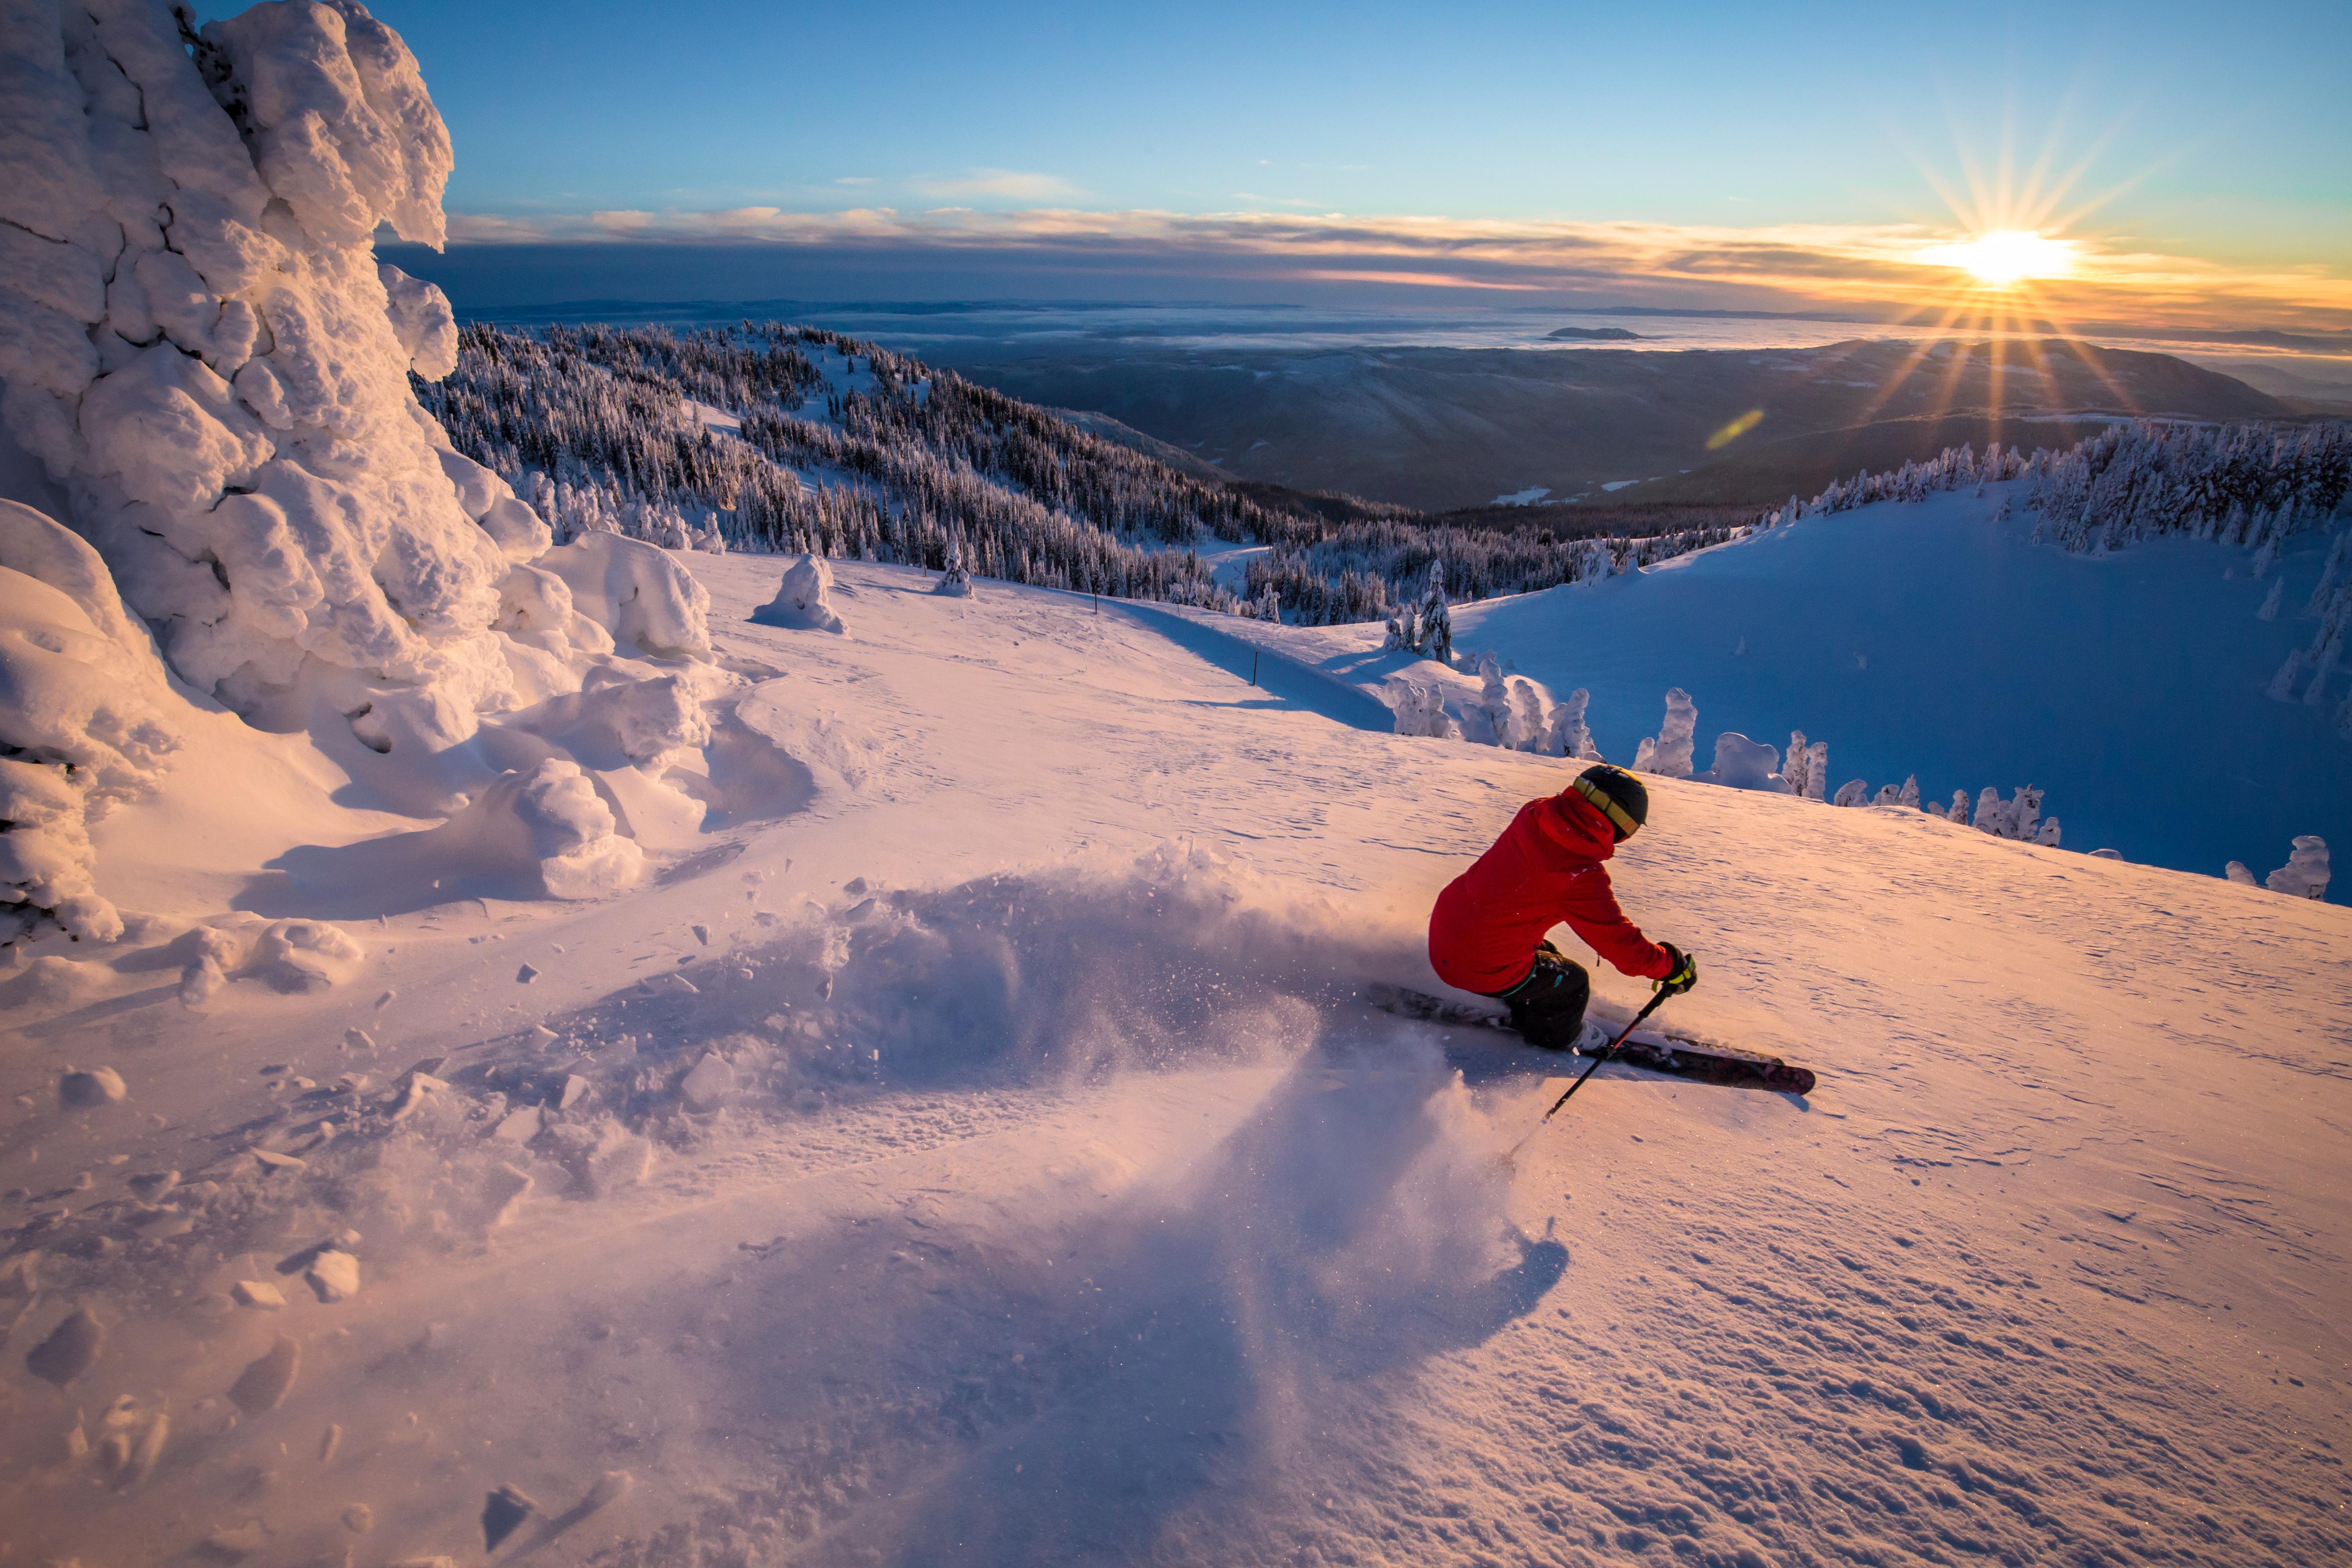 skican | sun peaks ski resort | ski destinations in western canada